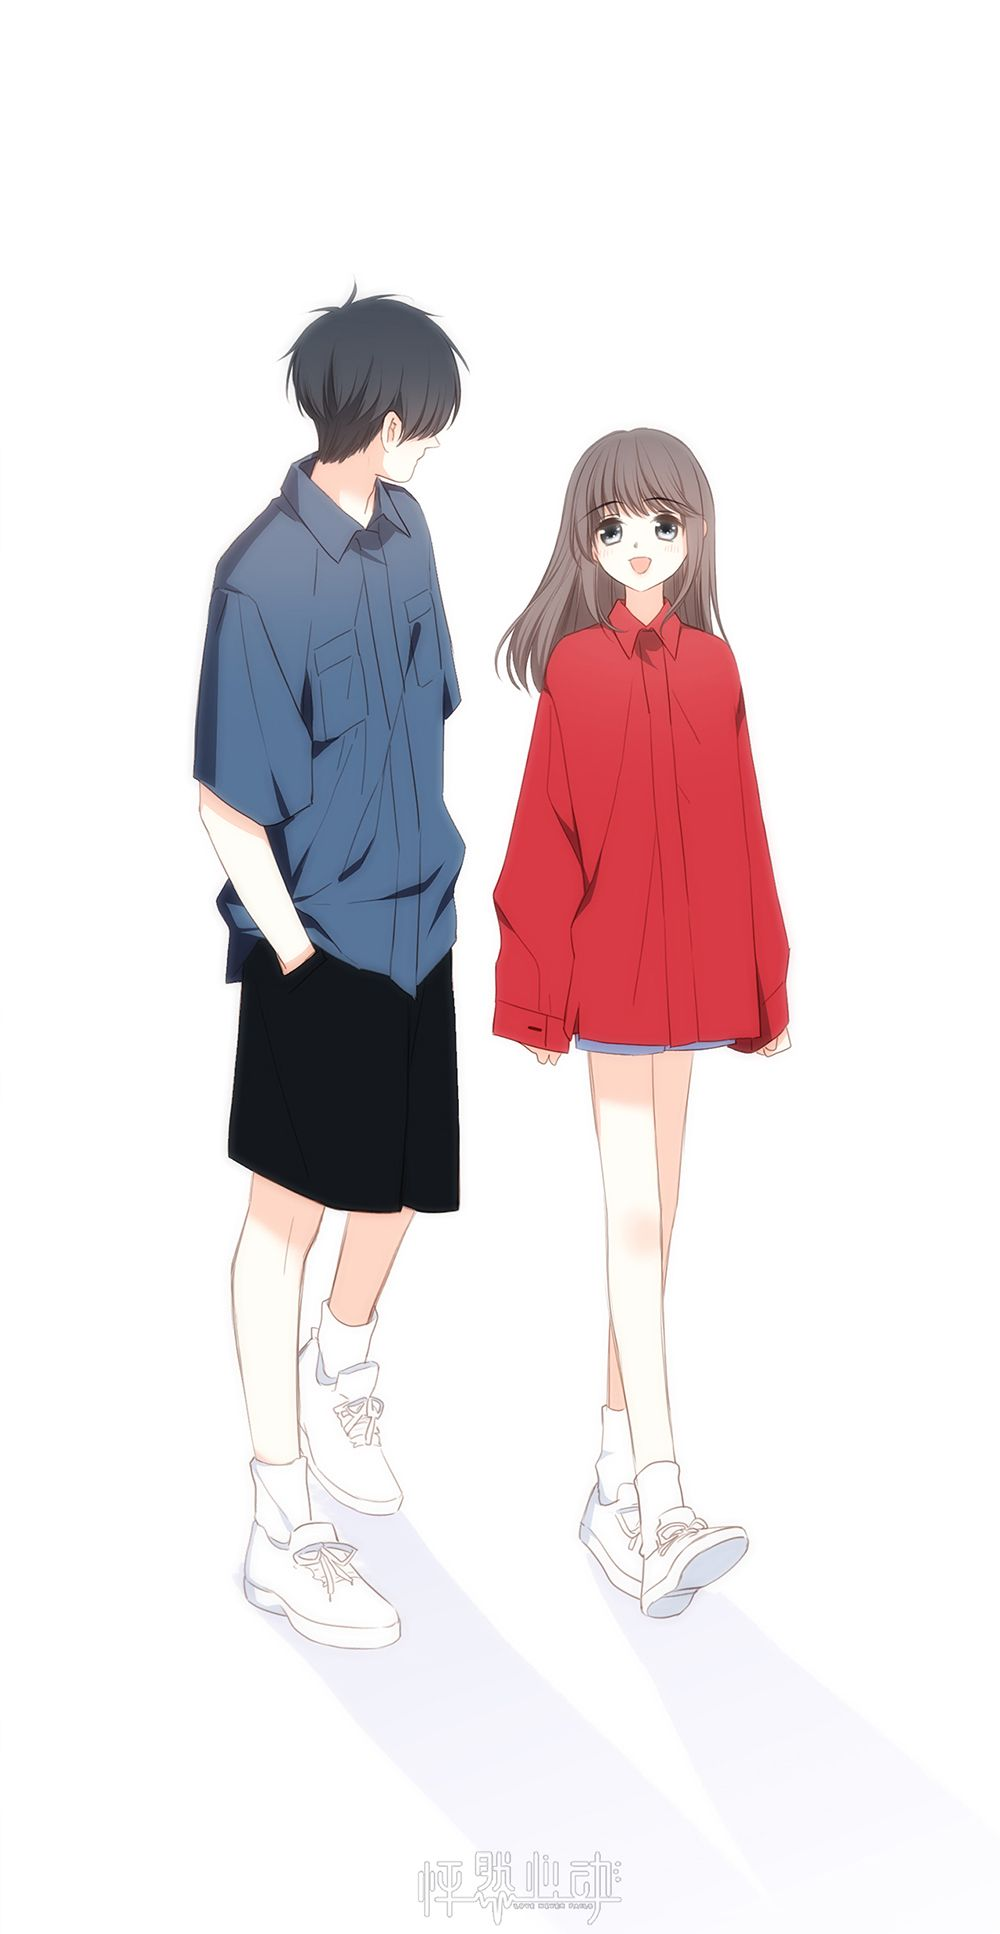 Love In 2019 Cute Couple Pictures Cartoon Cute Within Cartoon Wallpaper Couple Cute Cartoon Wallpapers Cute Couple Cartoon Cute Couple Wallpaper